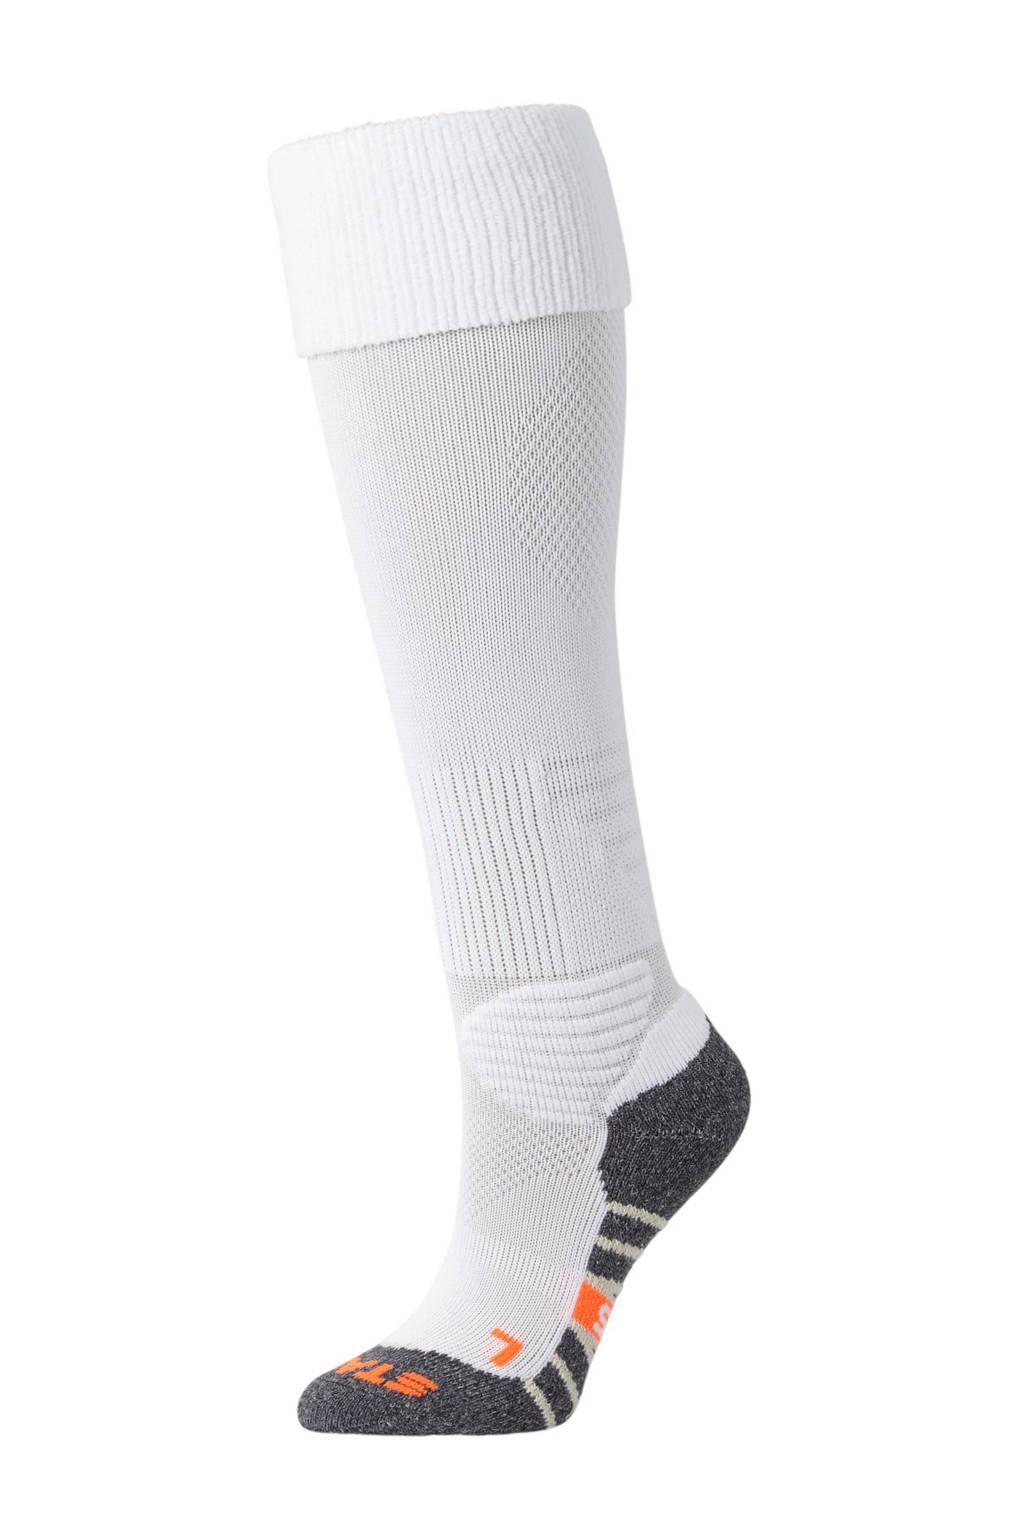 Stanno   sportsokken sokken, Wit